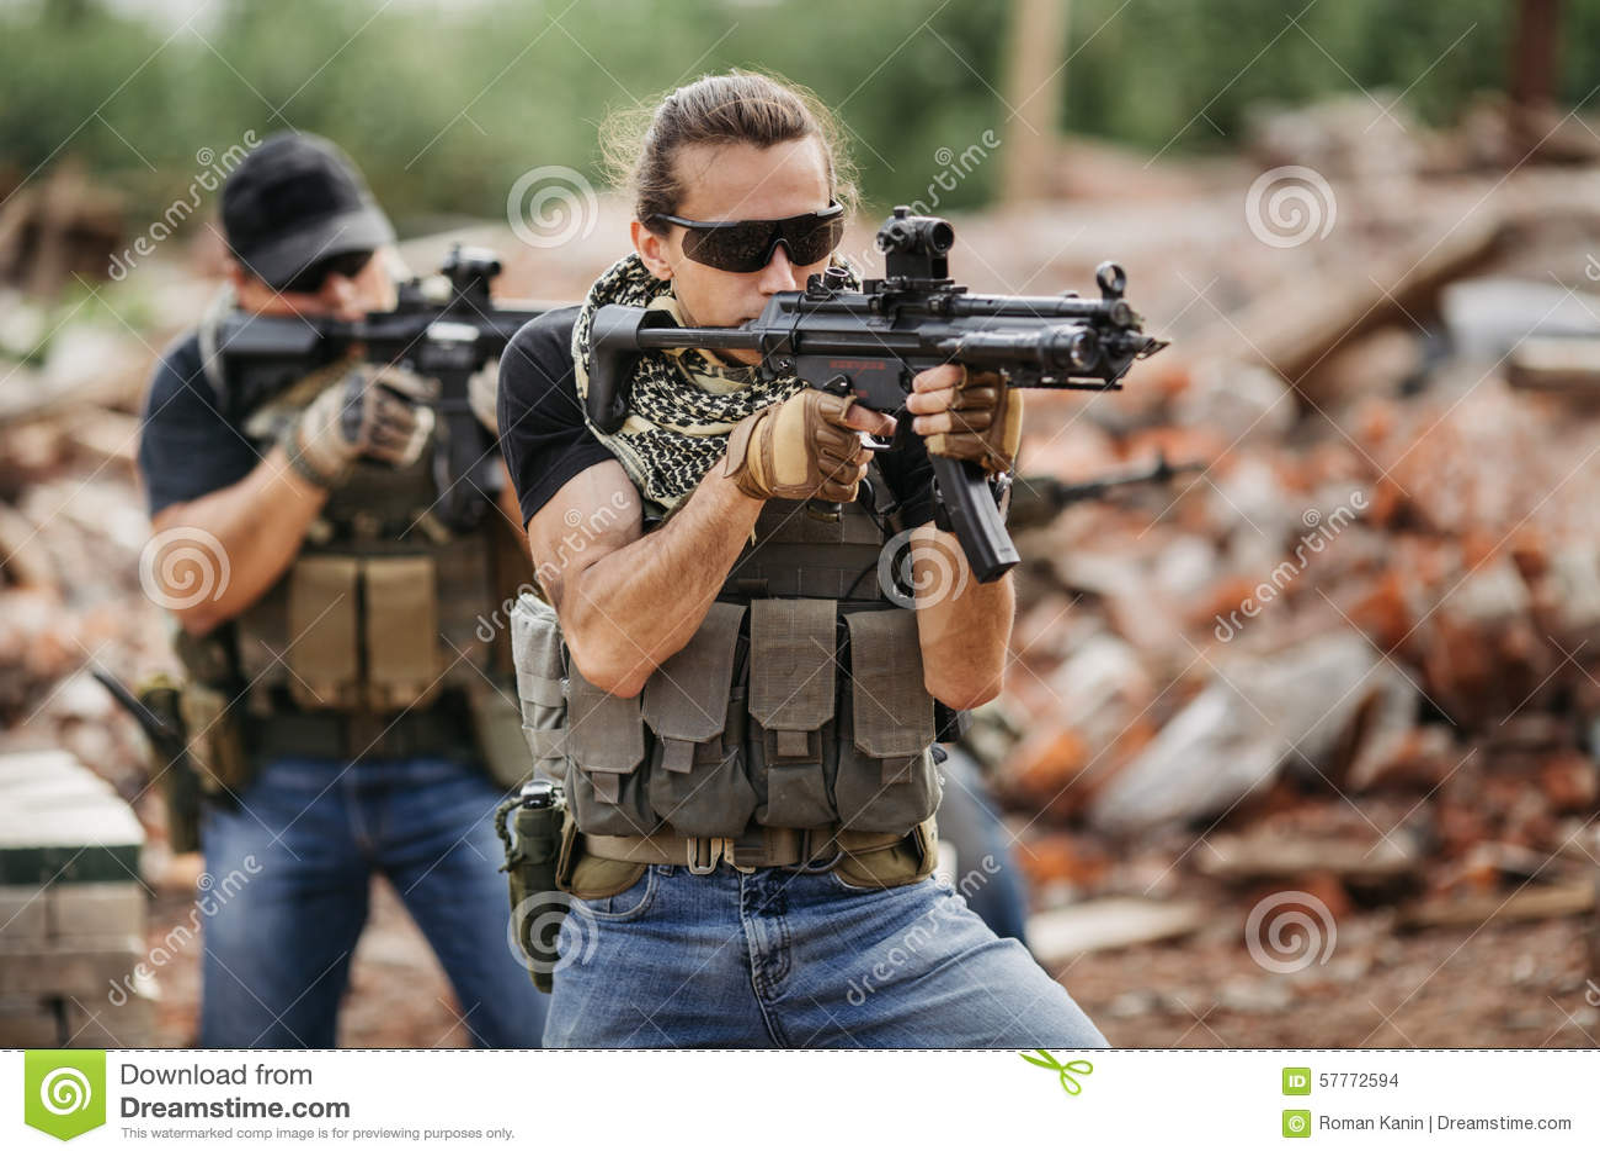 Battlefield 2 special forces key generator